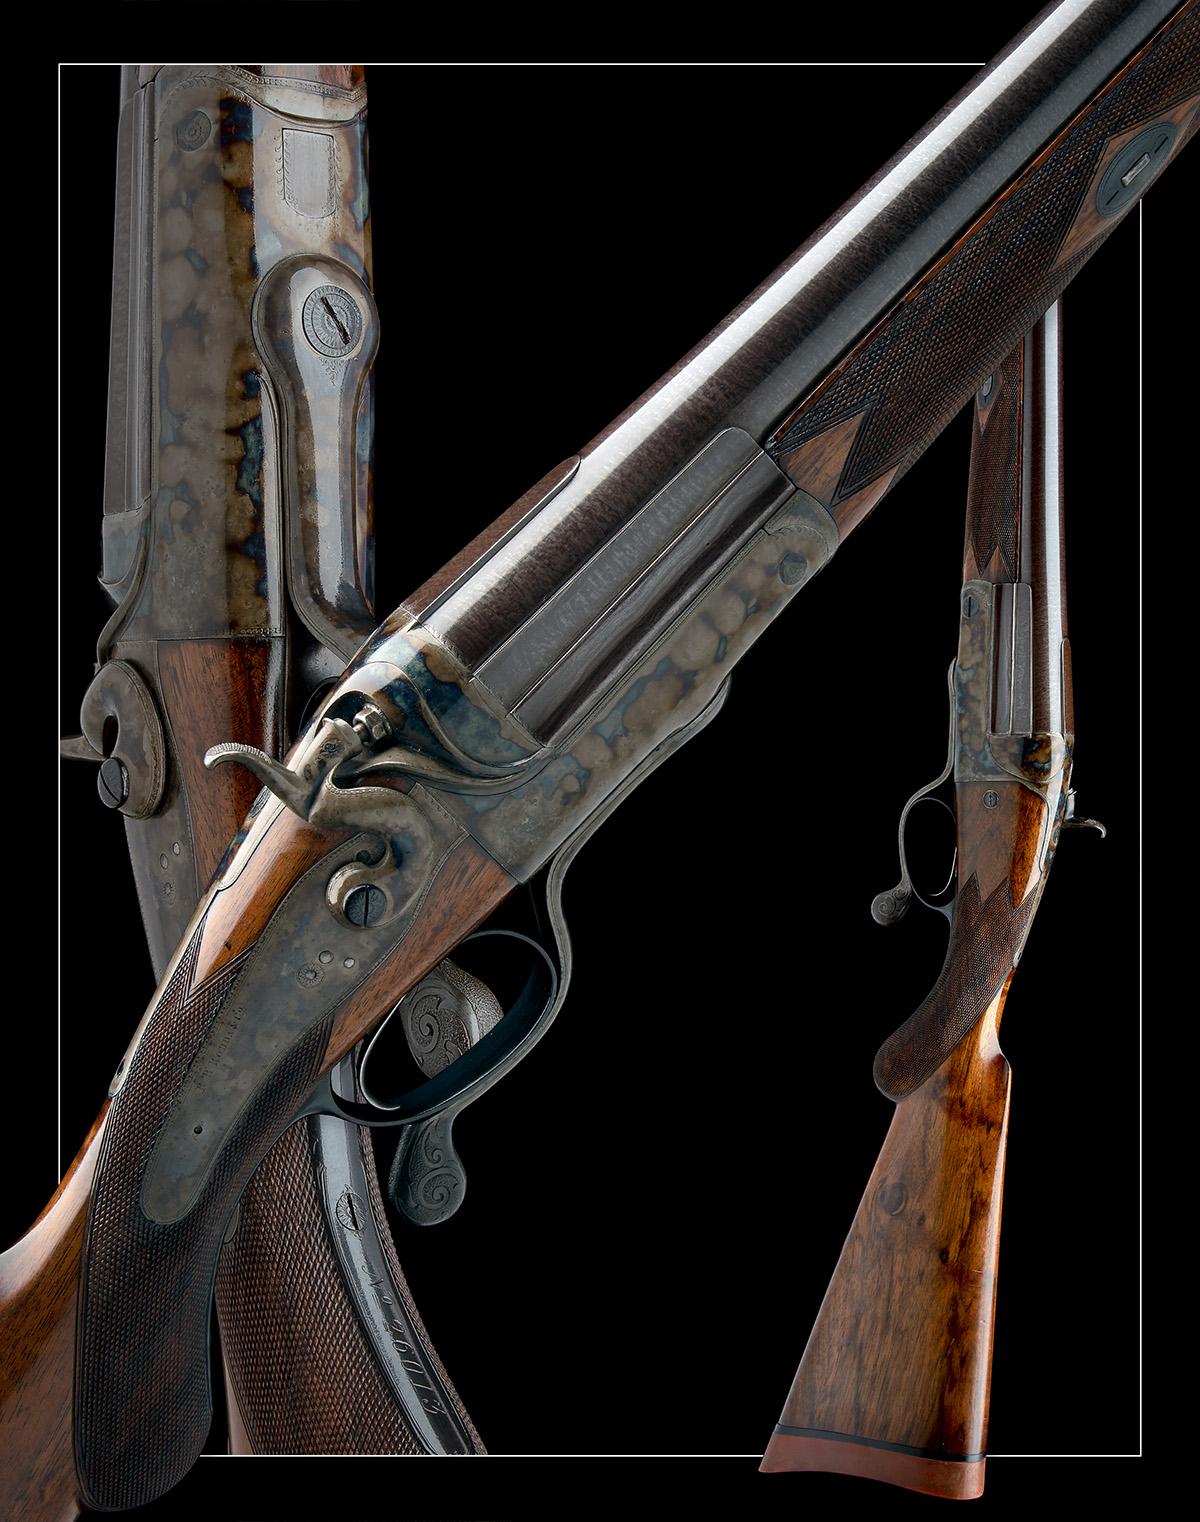 R.B. RODDA A 4-BORE SINGLE-BARRELLED ROTARY-UNDERLEVER HAMMERGUN, serial no. 26013, circa 1880, 38 - Image 8 of 8